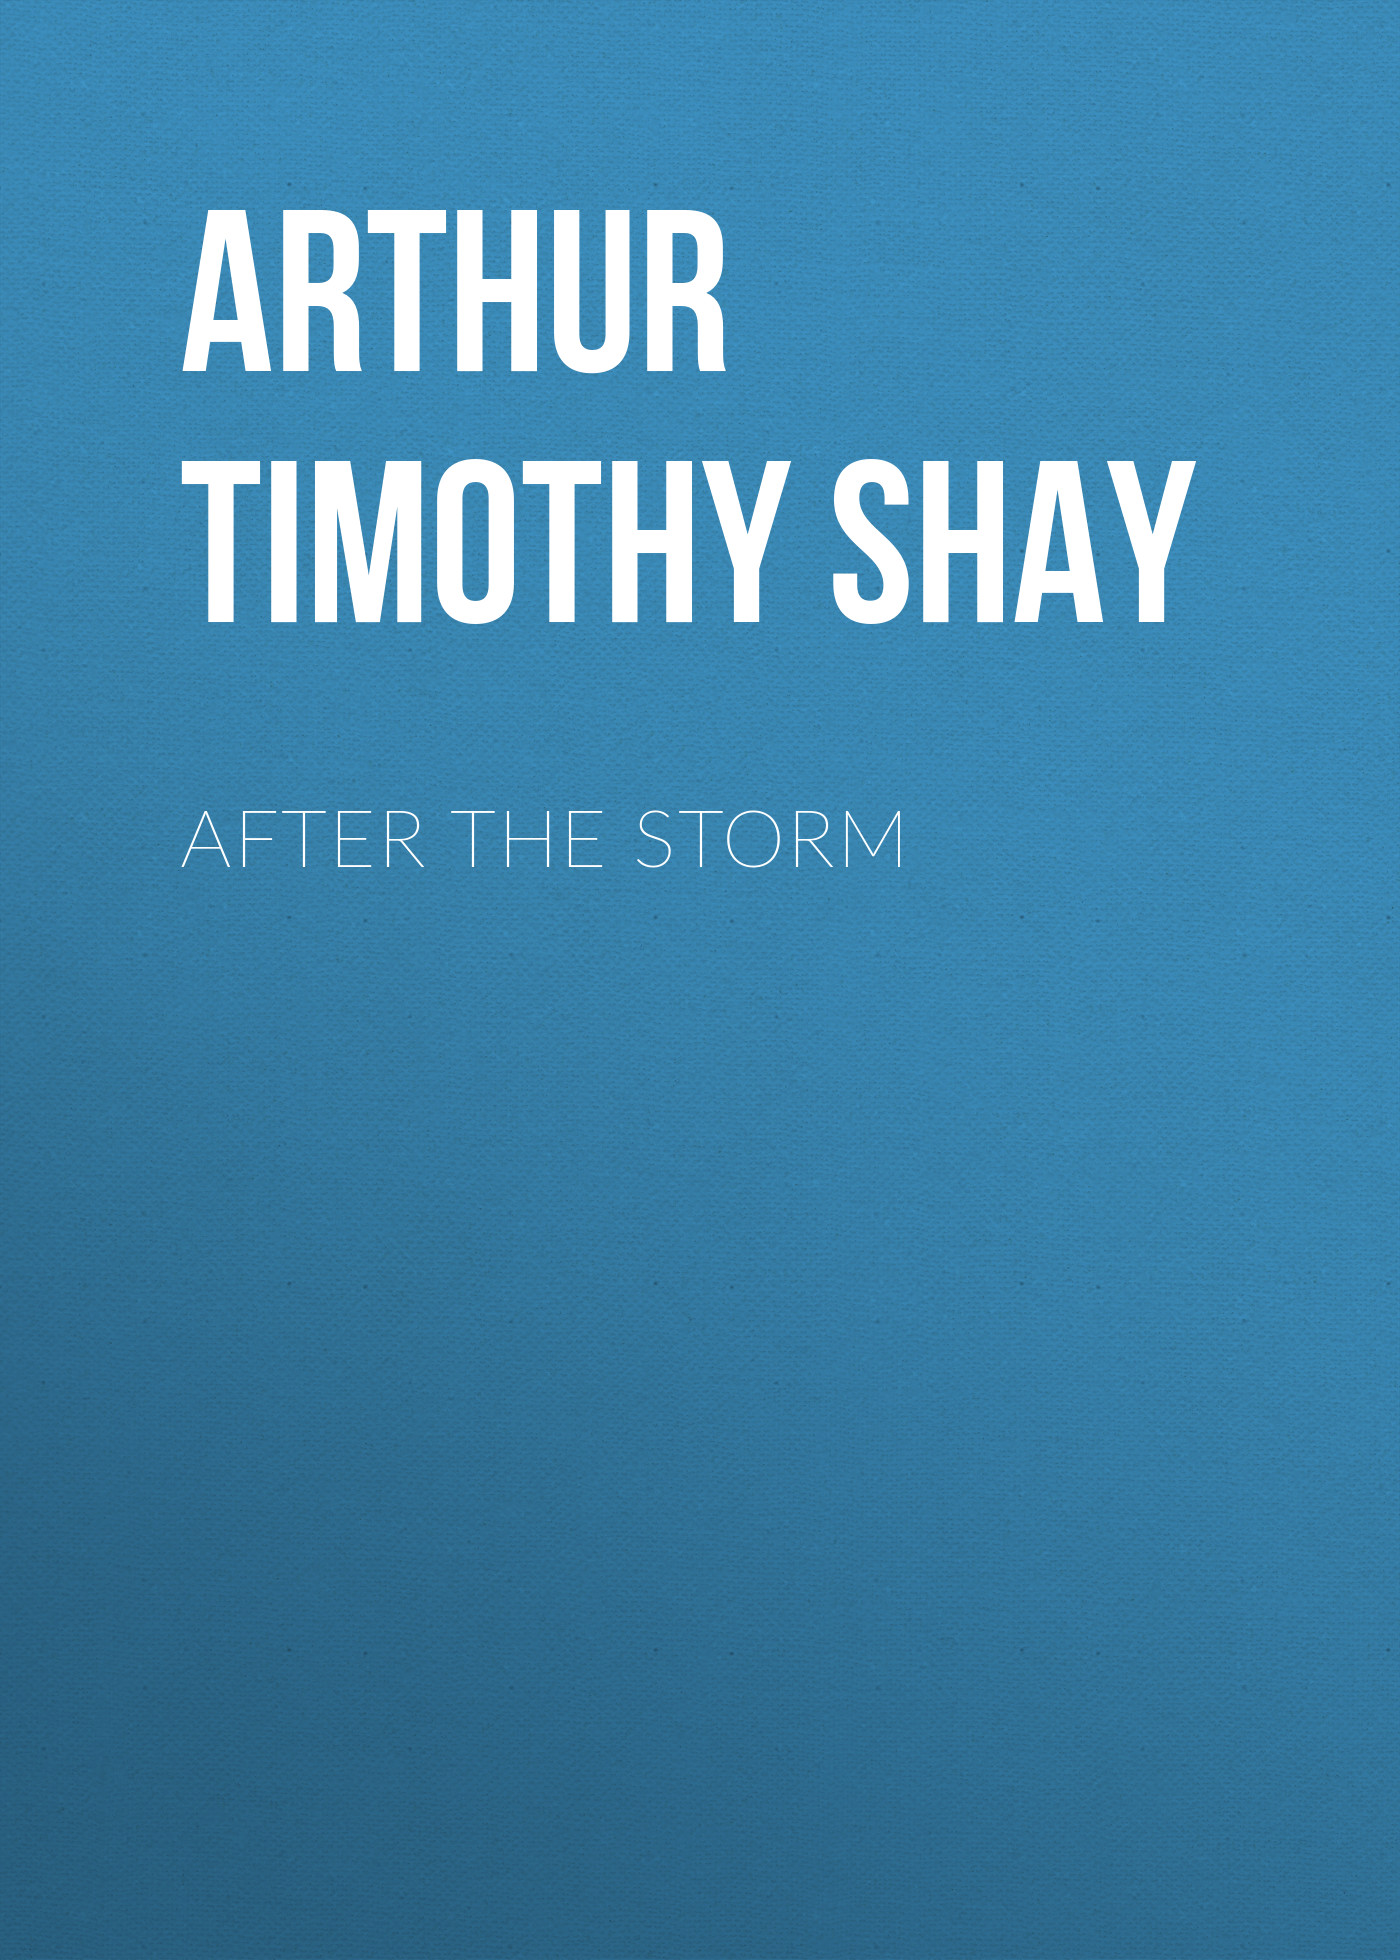 лучшая цена Arthur Timothy Shay After the Storm